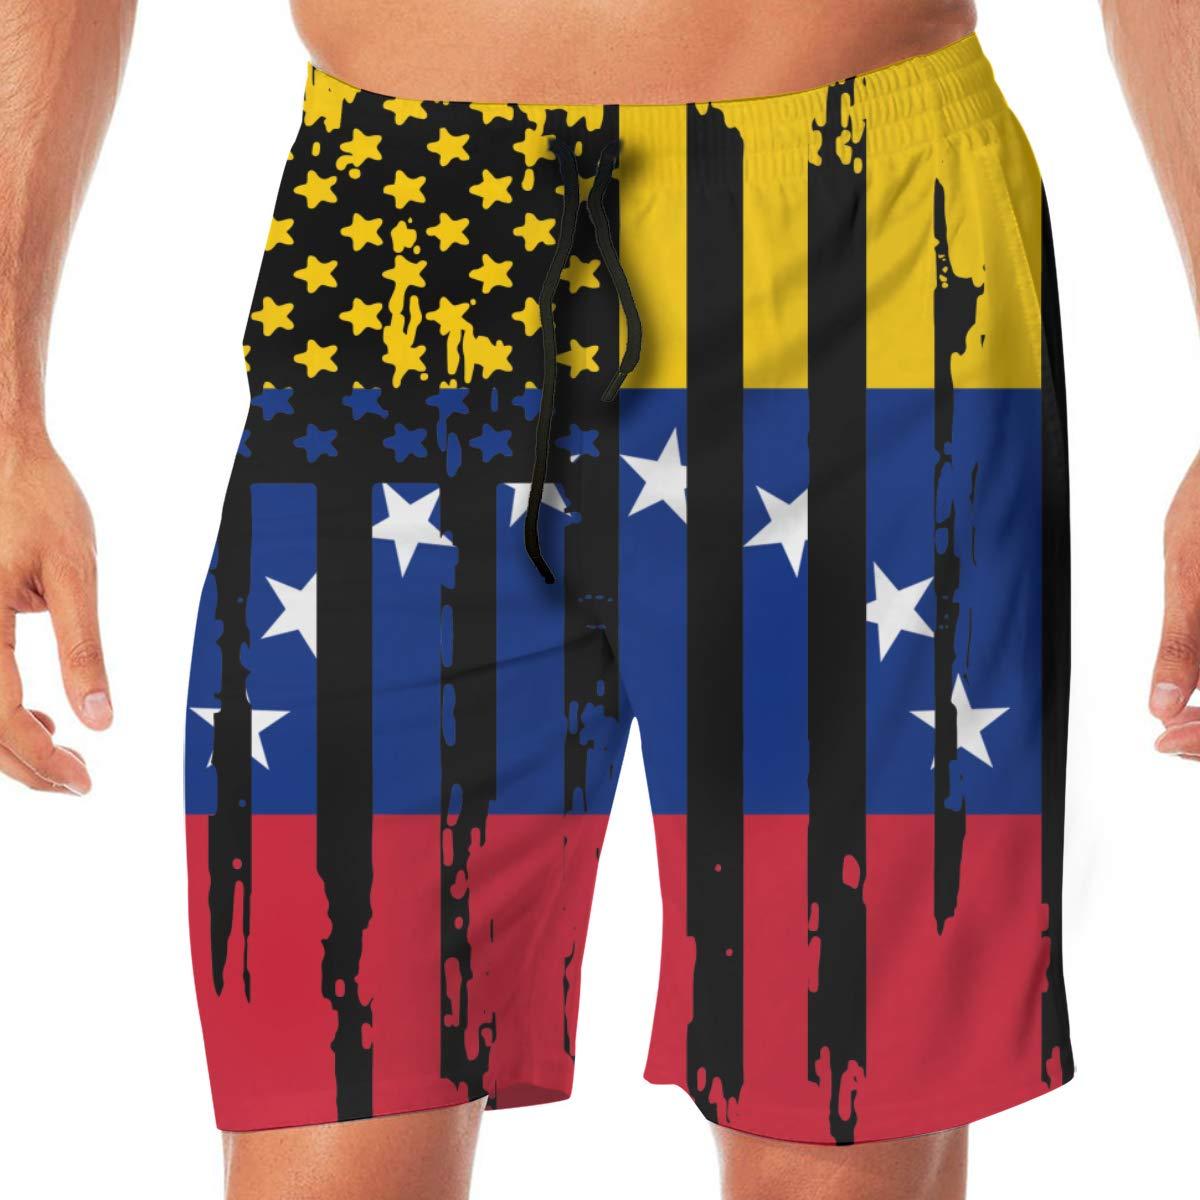 Mens Abstract American Venezuela Flag Boardshorts Beach Pants No Mesh Lining